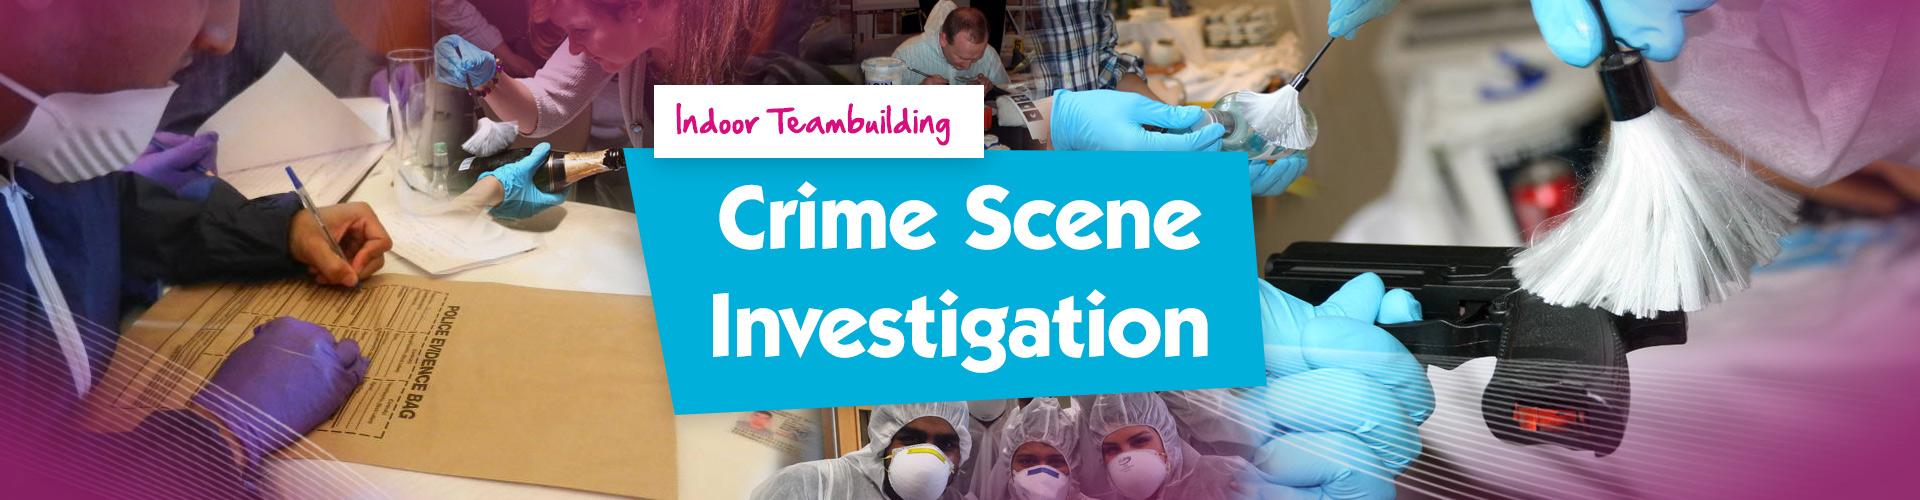 Crime Scene Investigation Team Building